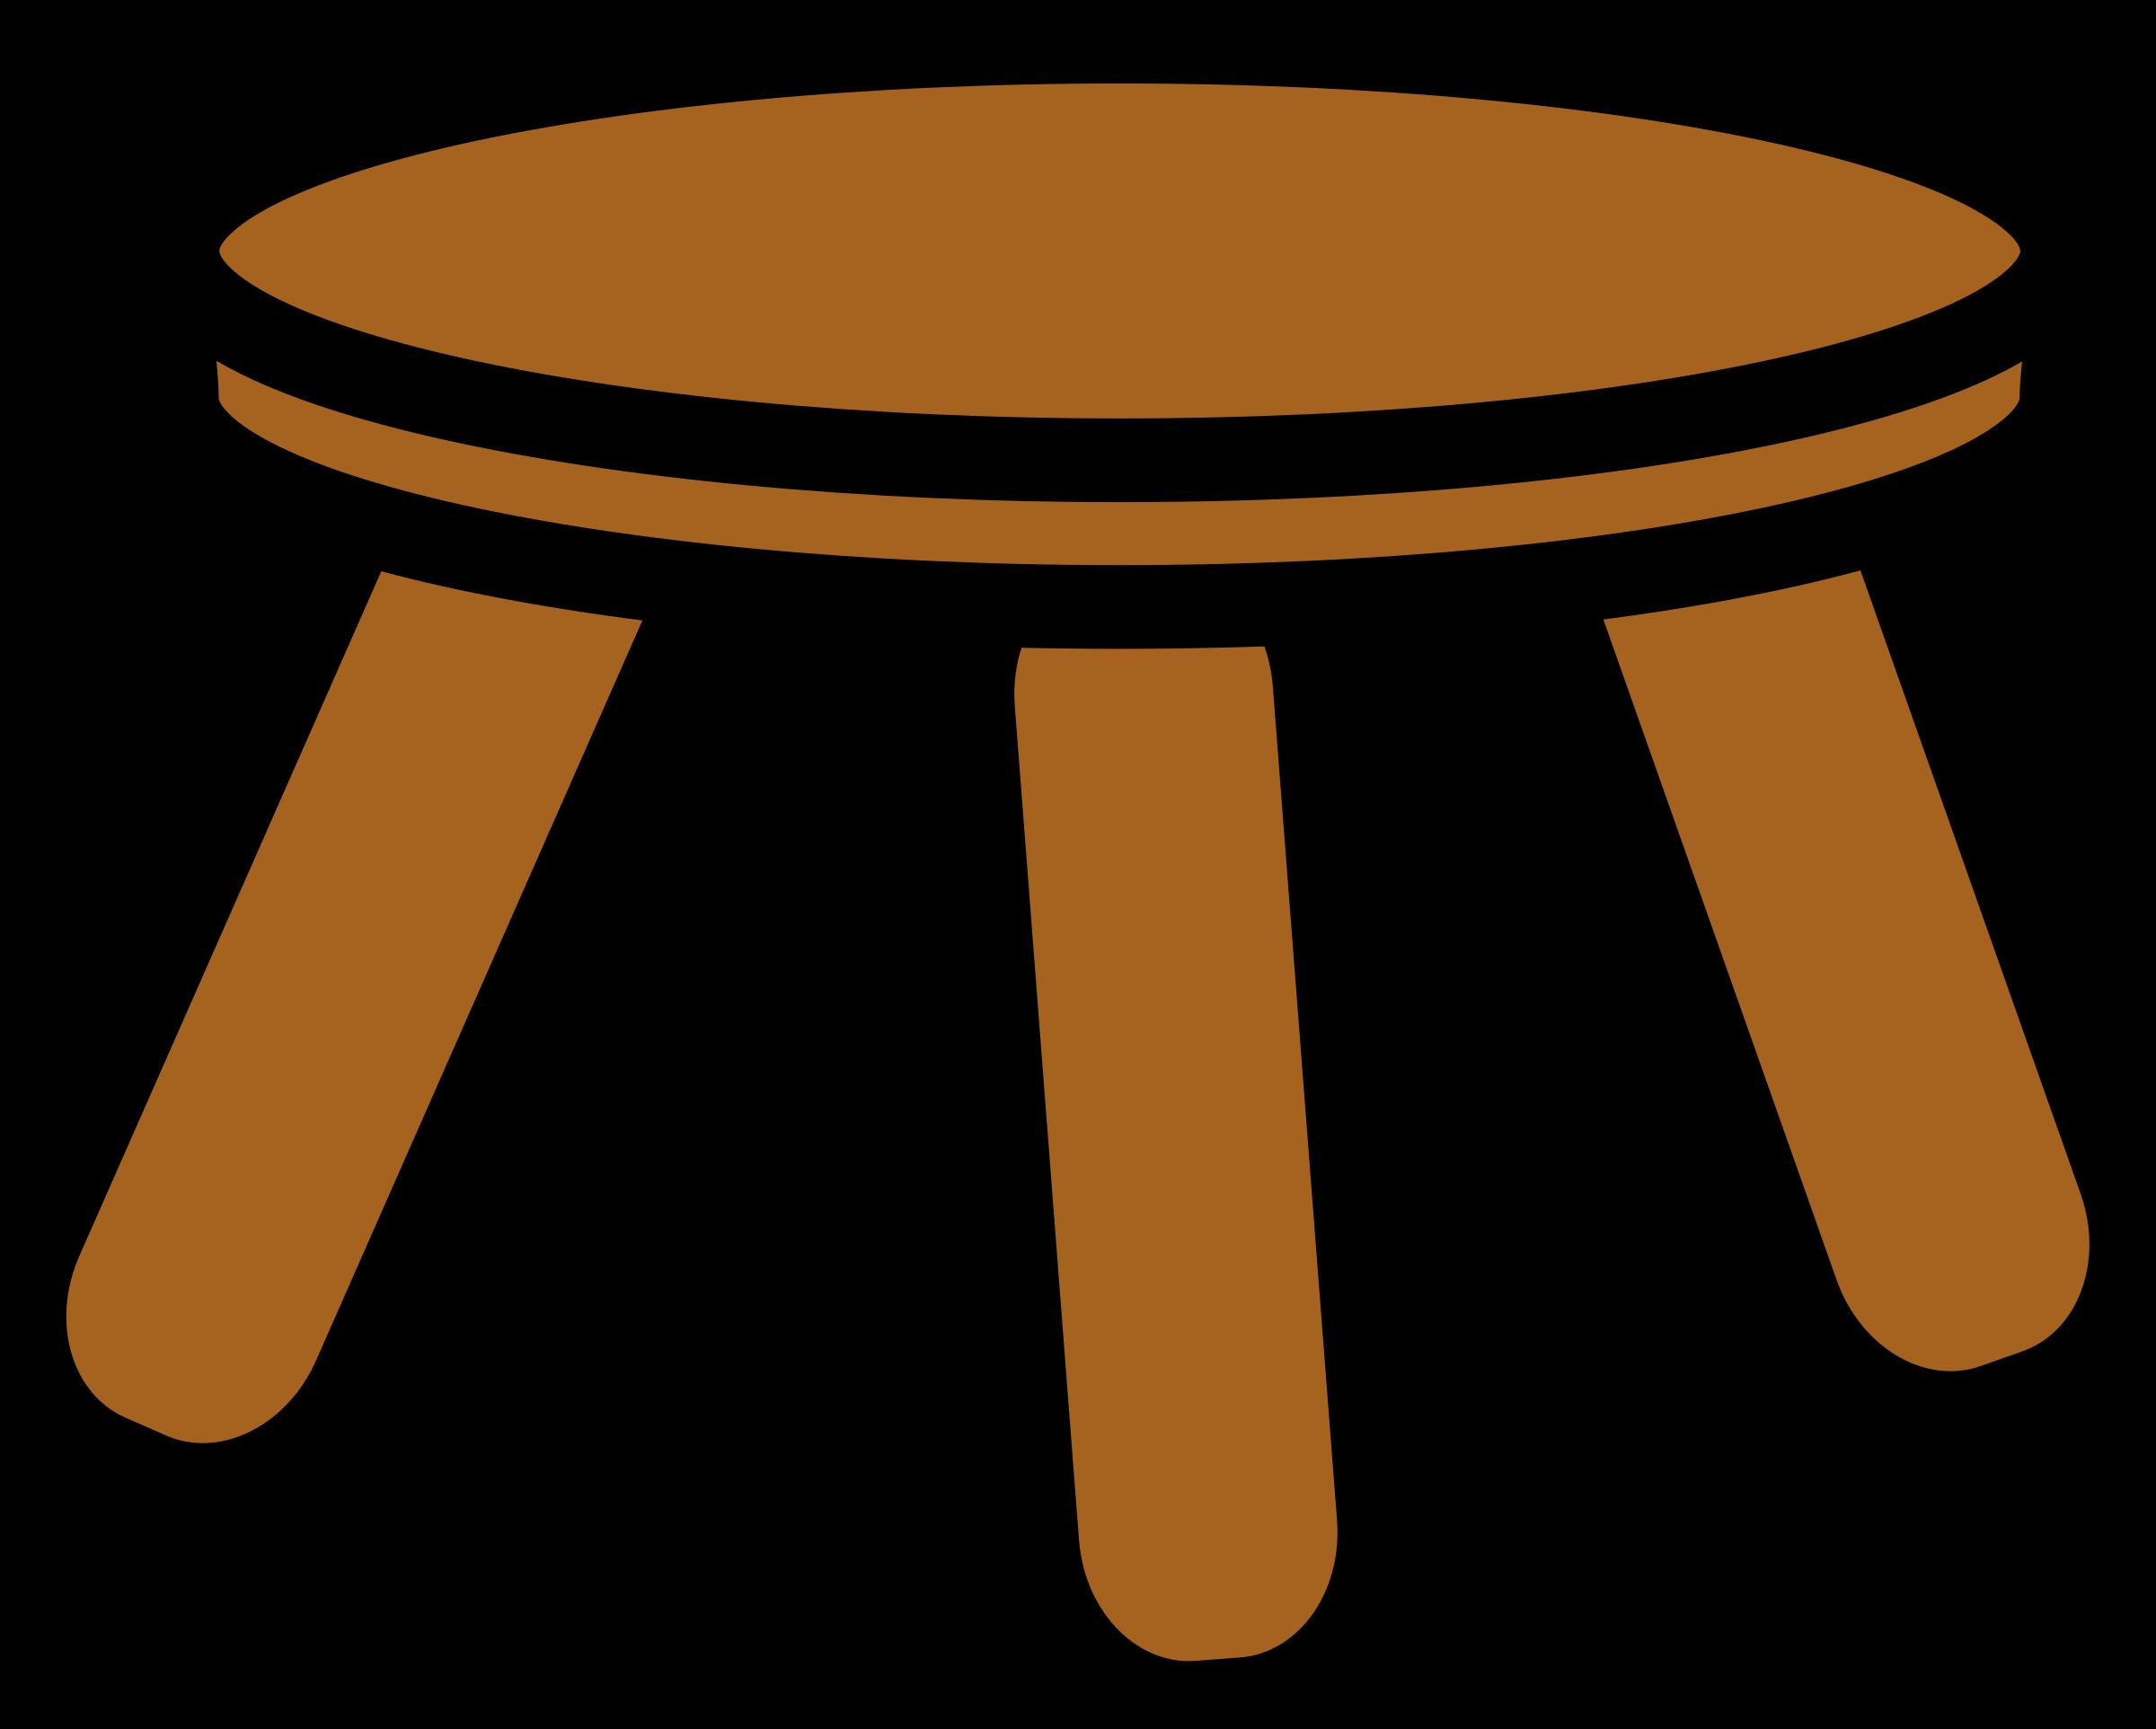 Stool big image png. Furniture clipart wooden furniture